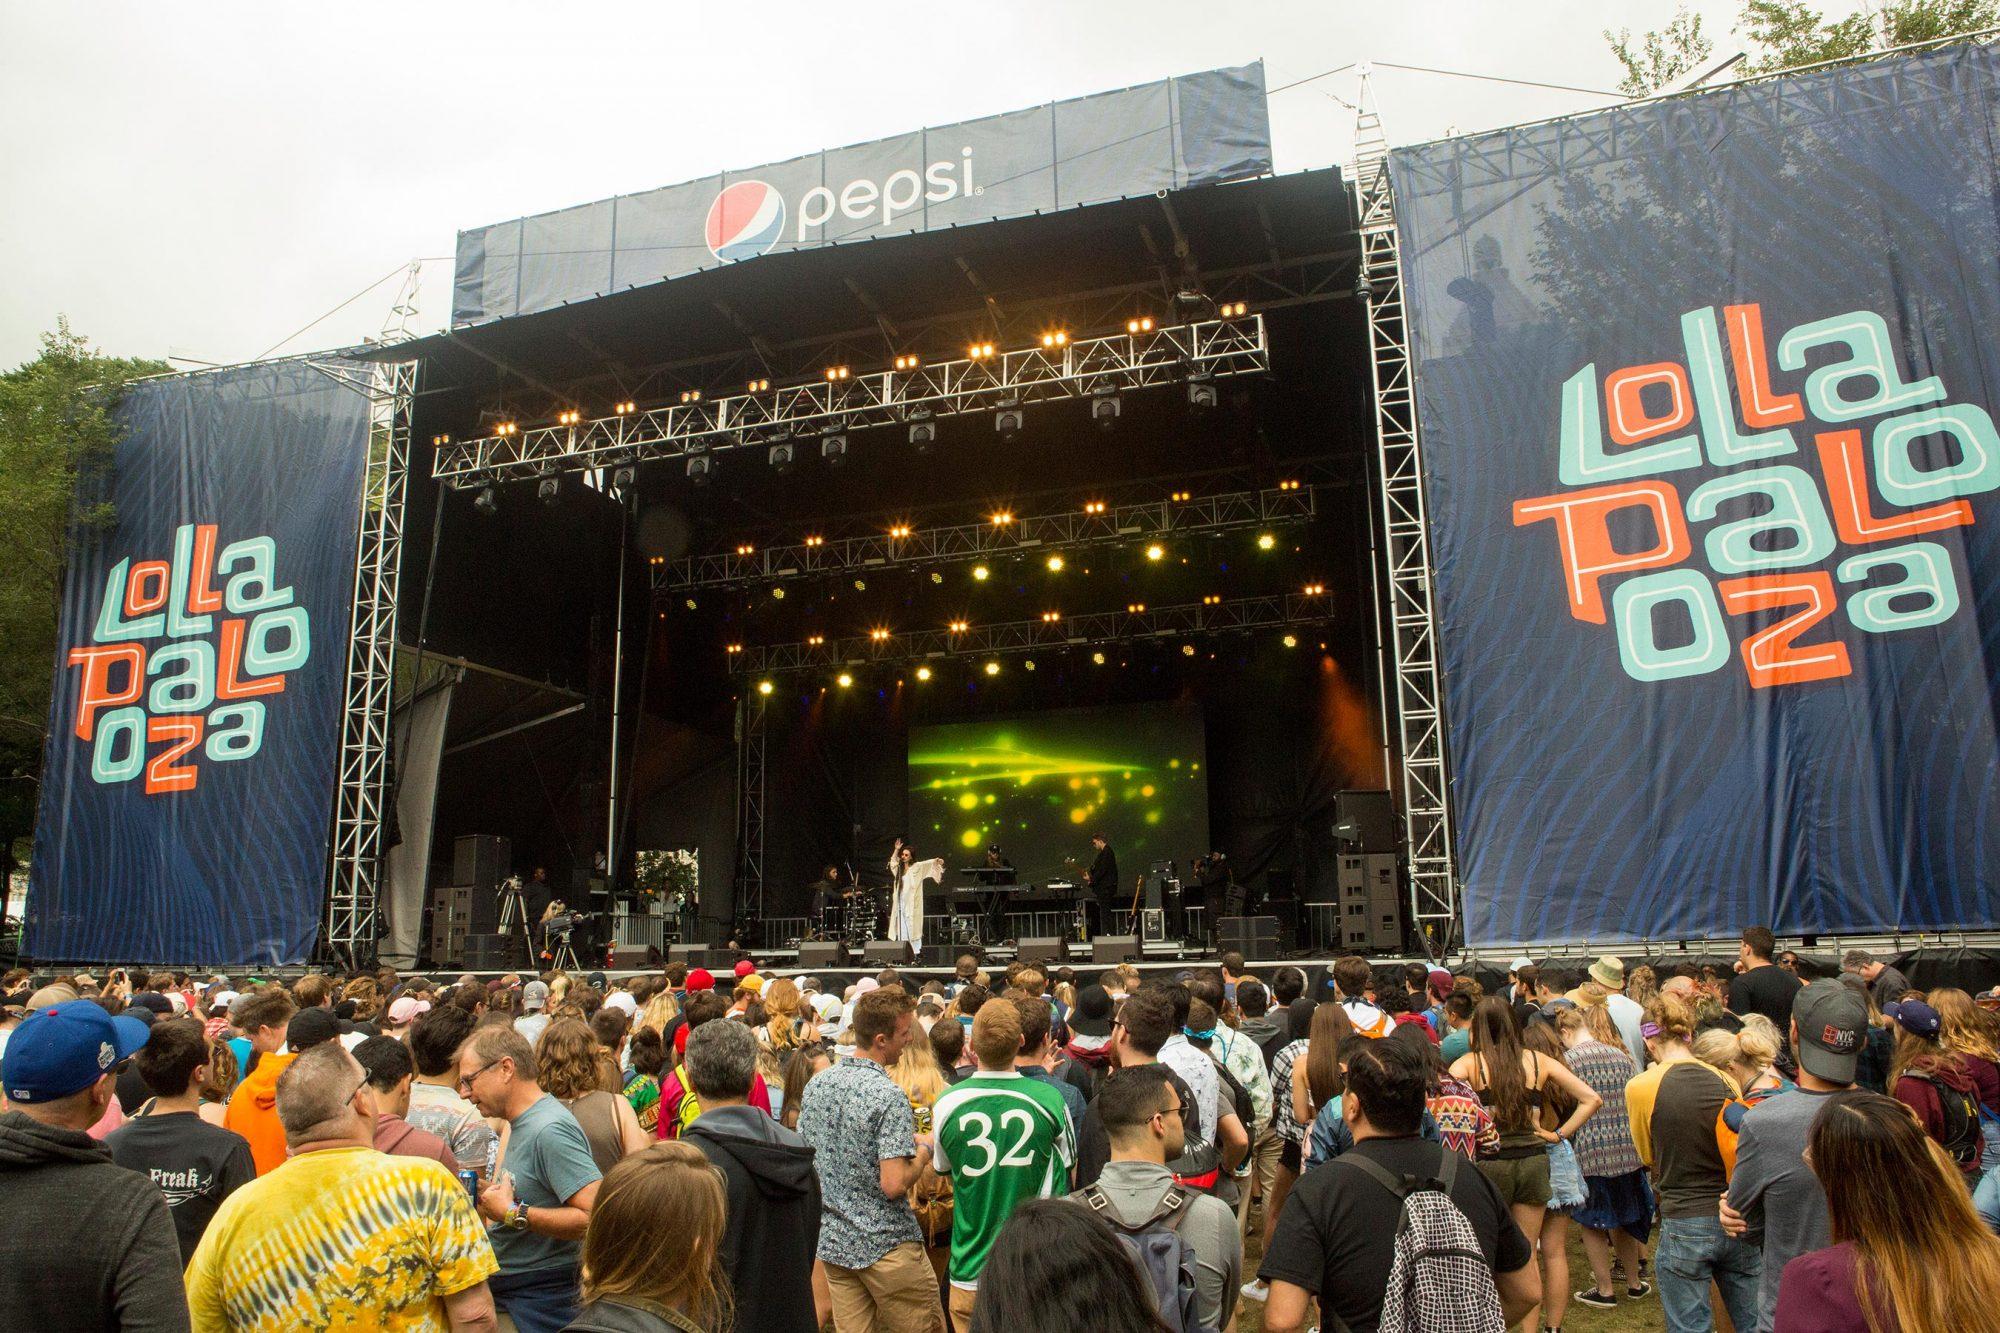 2017 Lollapalooza - Day 2